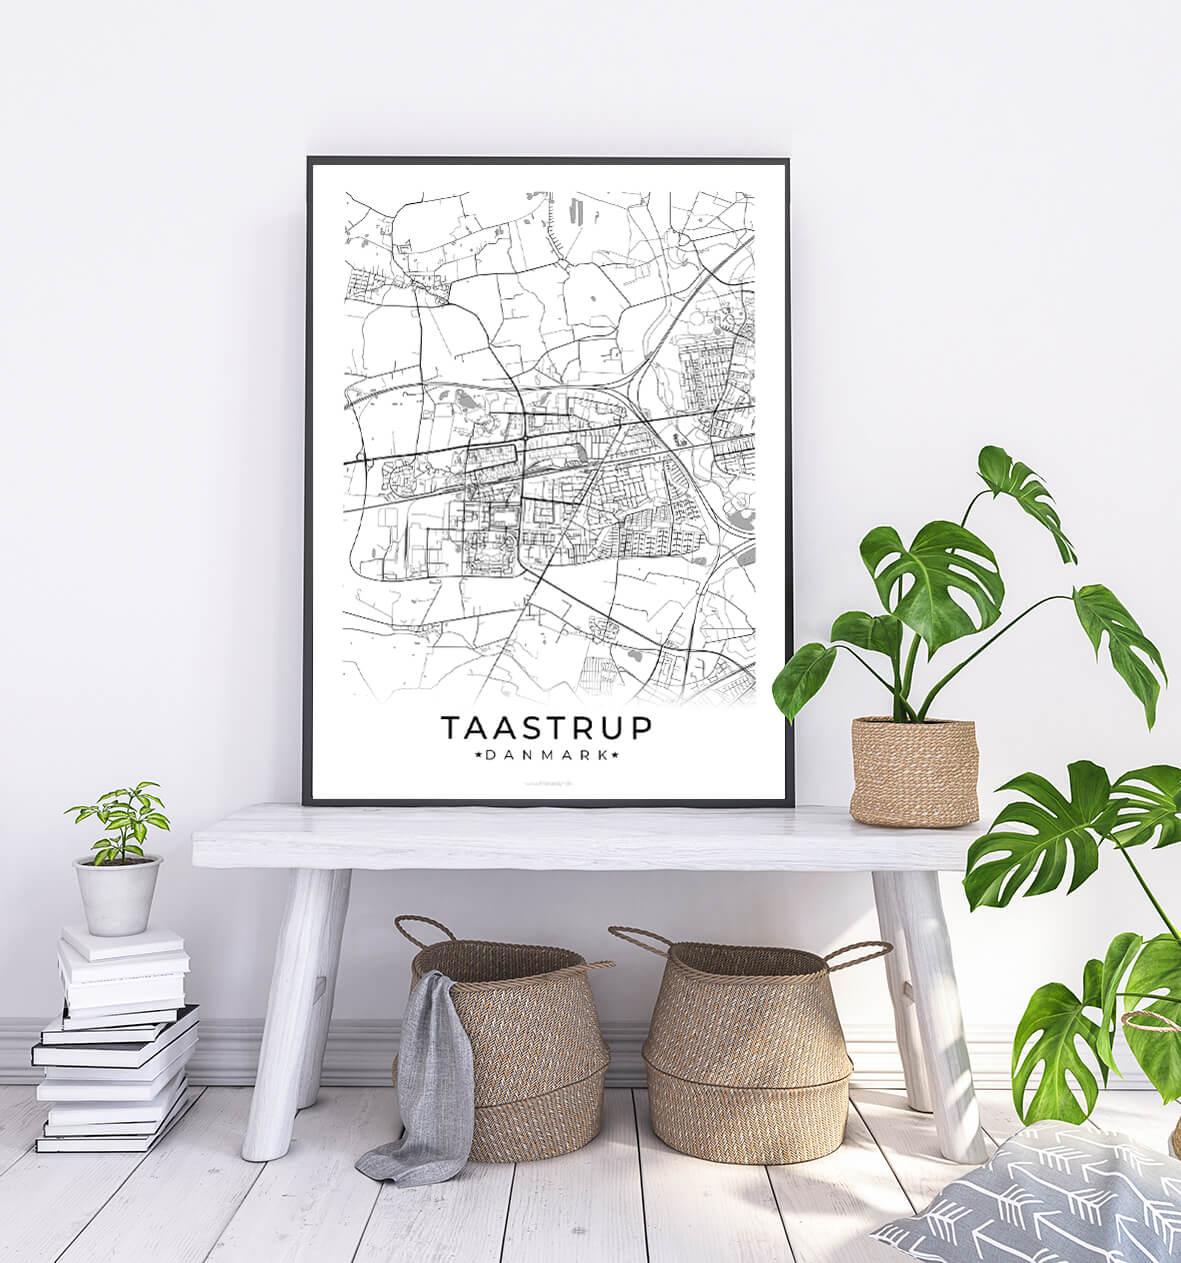 Taastrup-hvid-byplakat-1